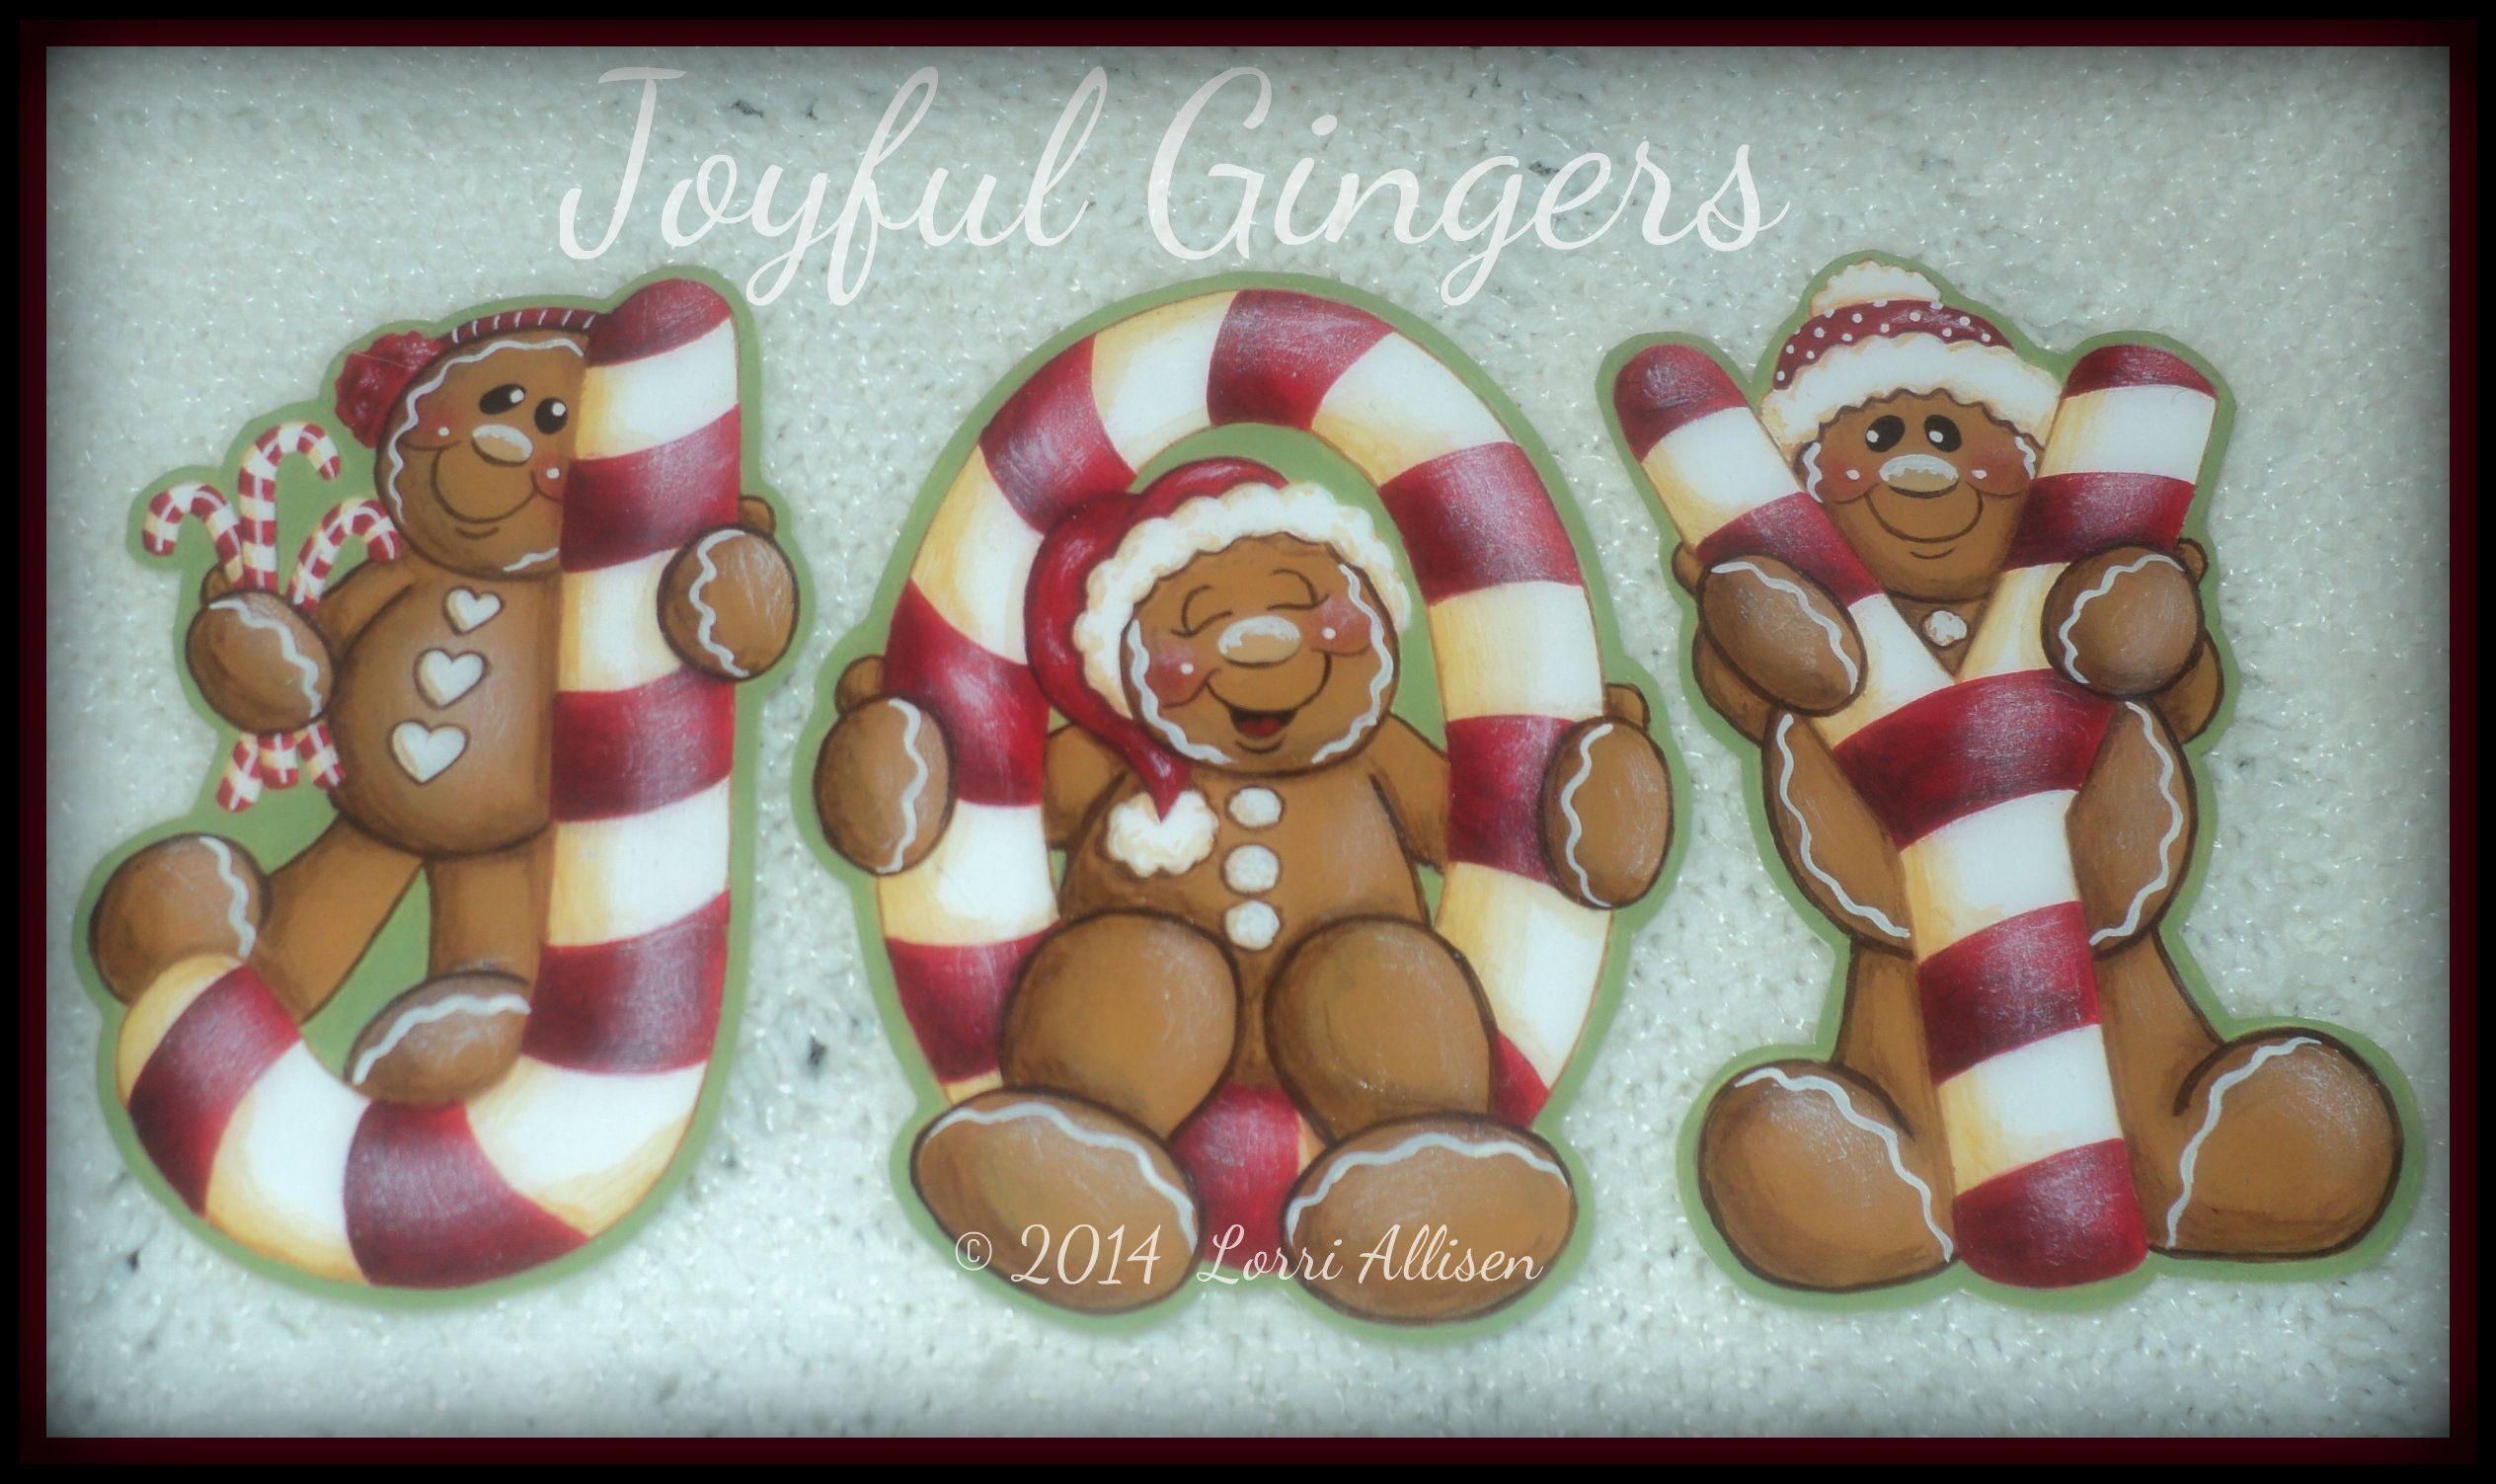 Joyful Gingers Painting Pattern Packet By Lorriallisendesigns On Etsy Instant Downloadable Pdf Fi Cartas De Navidad Muñecos De Gengibre Galletas De Gengibre